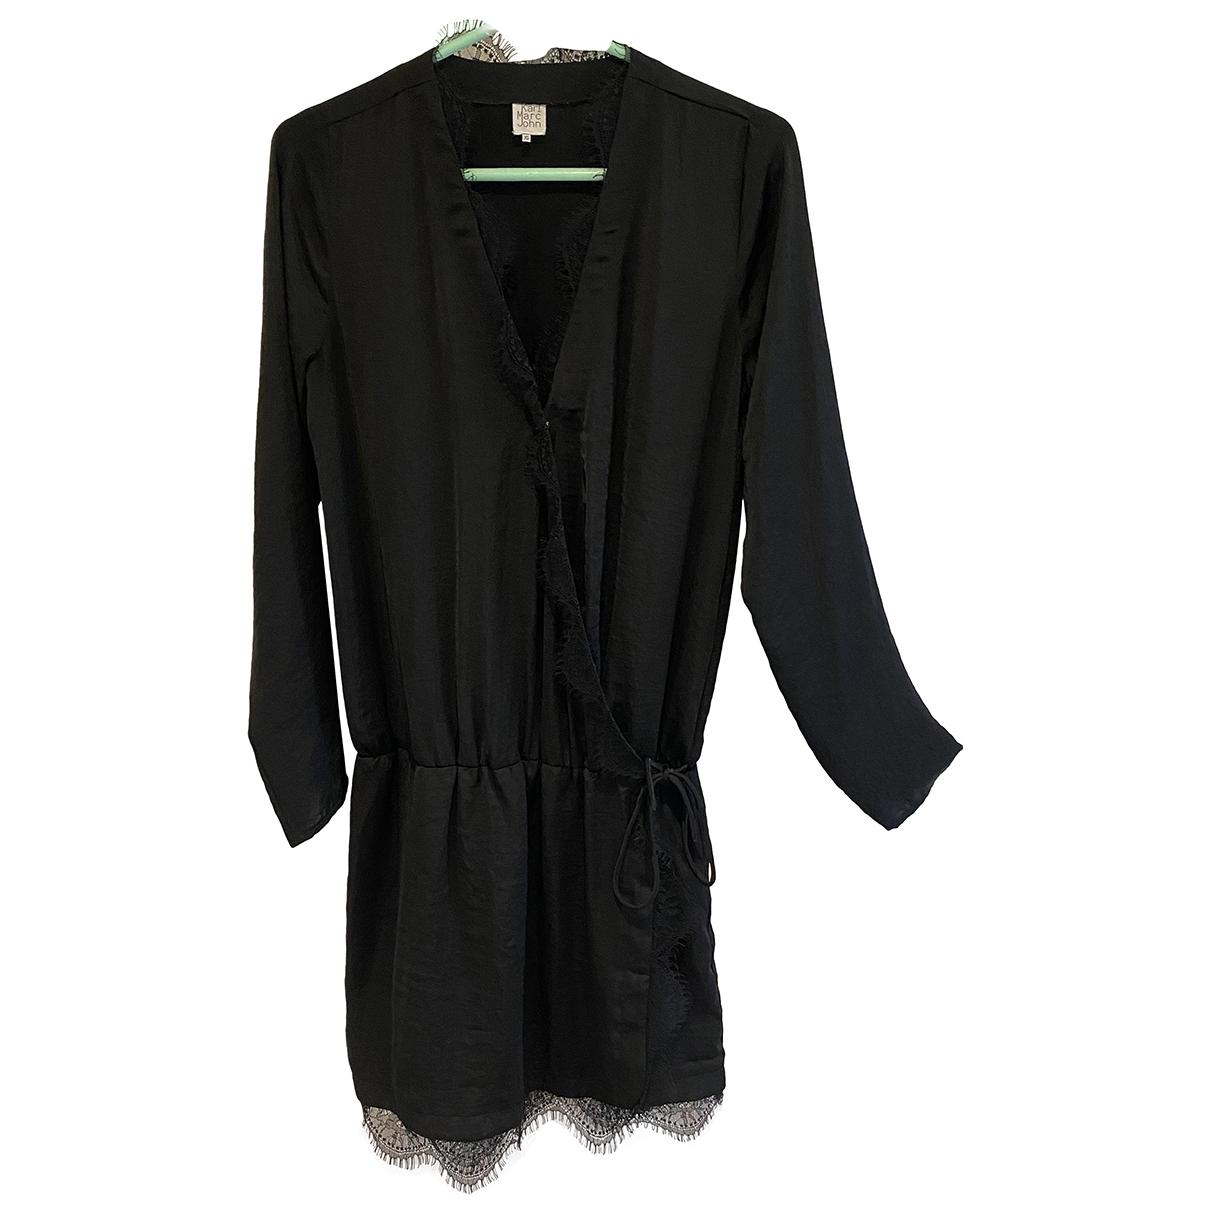 Karl Marc John \N Kleid in  Schwarz Polyester